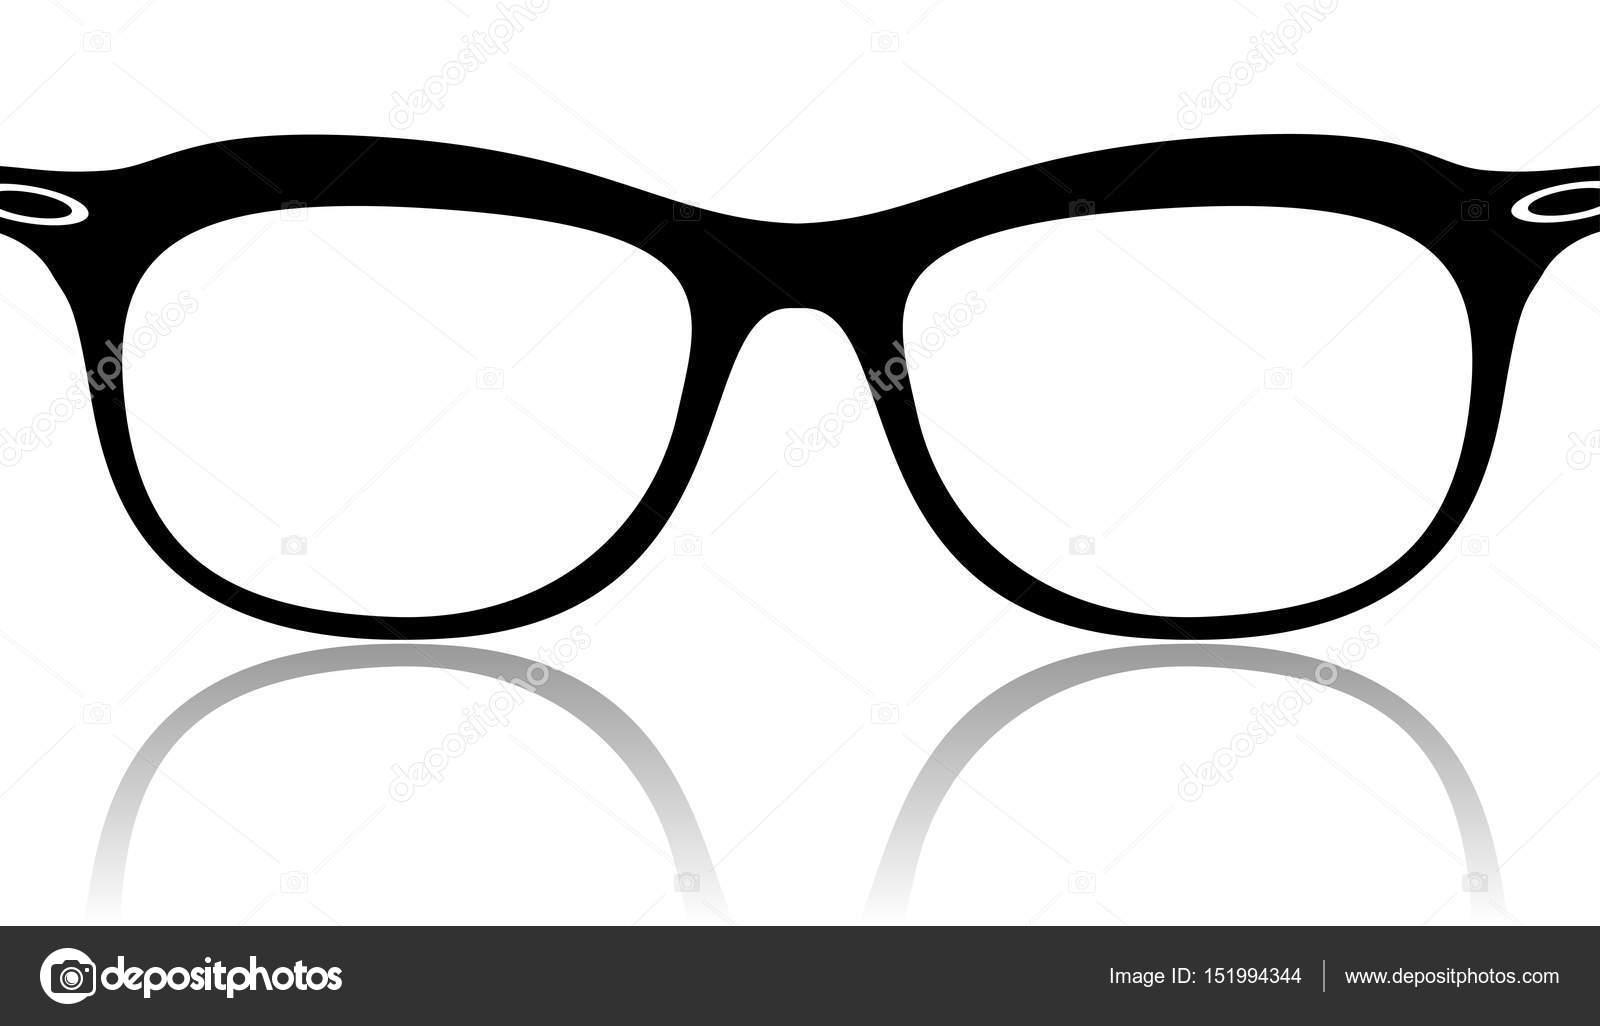 Marcos gafas negras — Vector de stock © leonardo255 #151994344